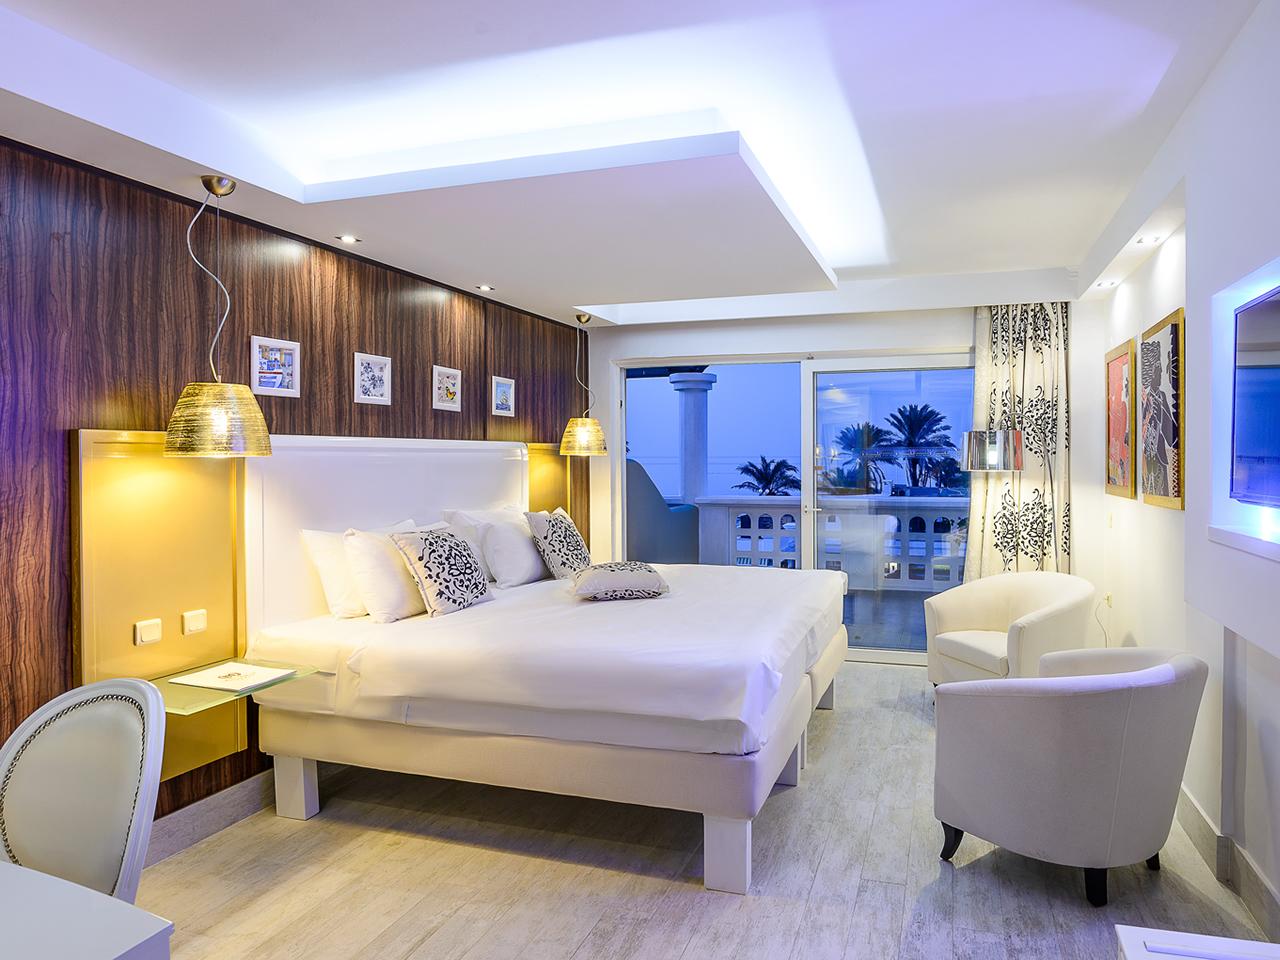 rooms-9_1280x960